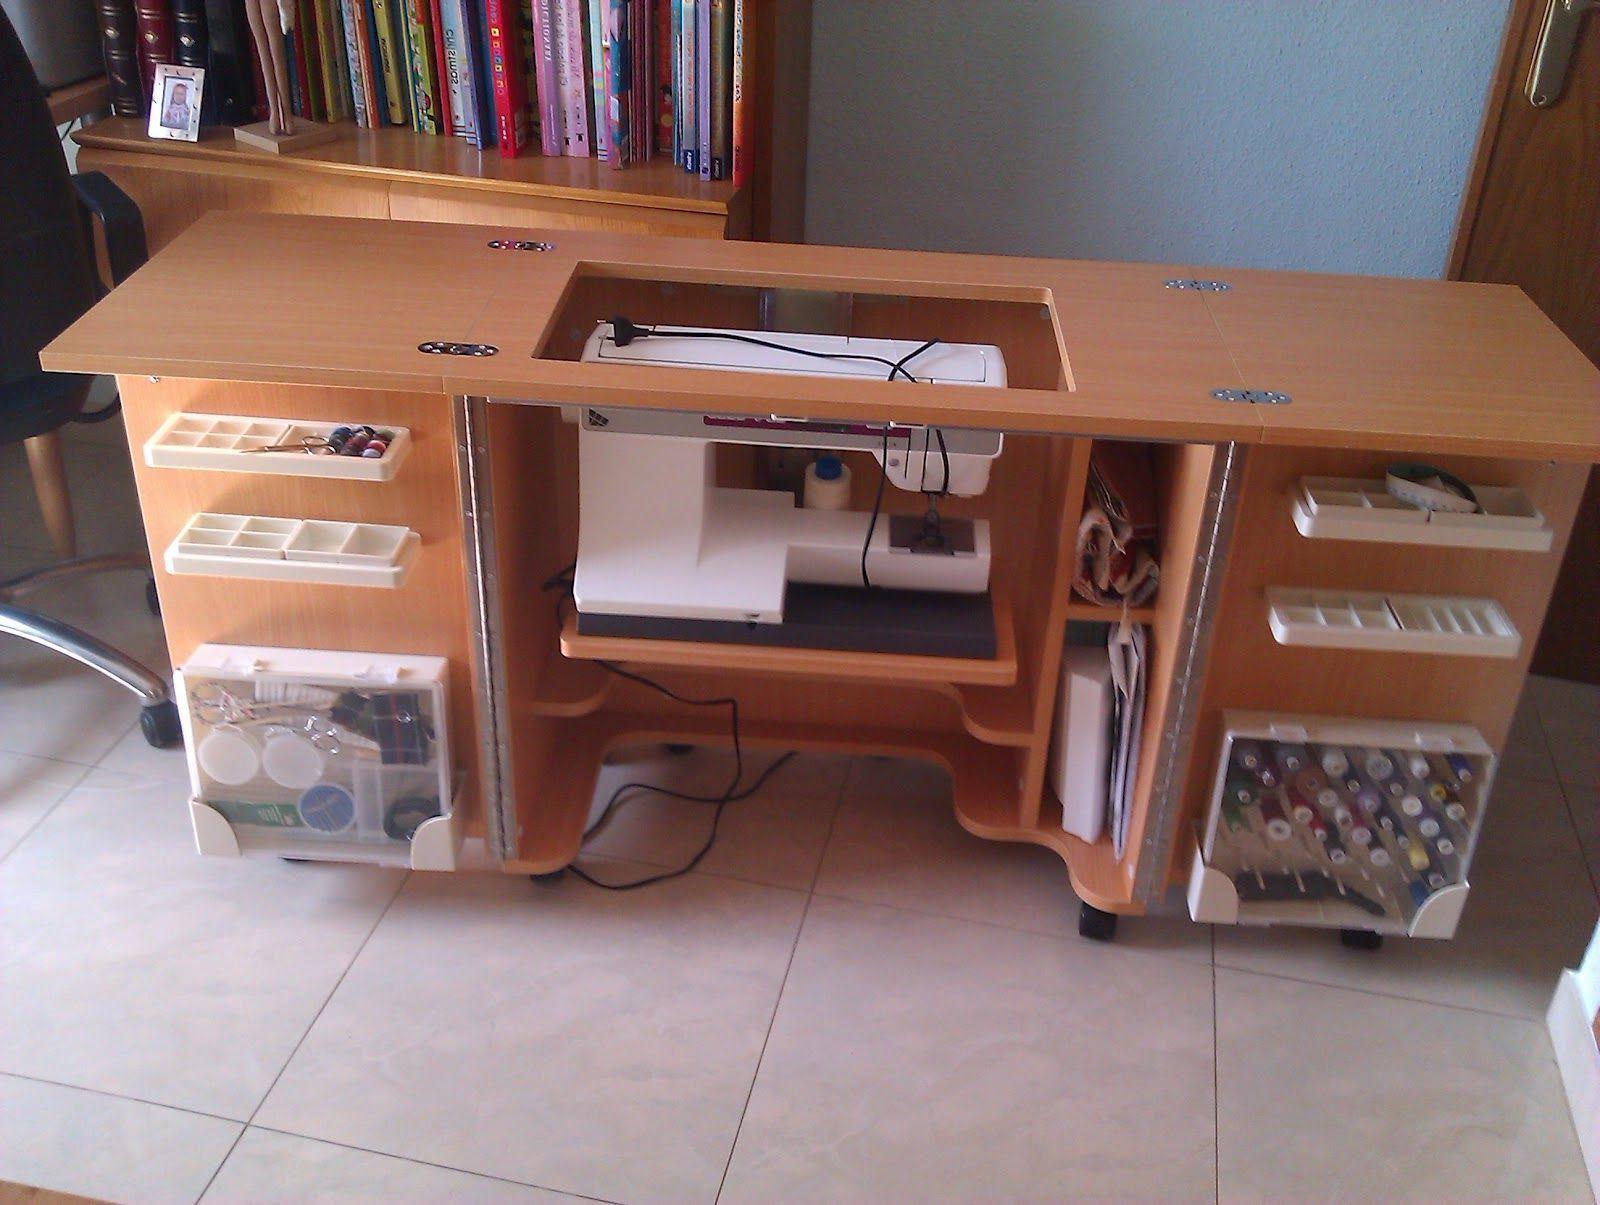 Mesa Para Maquina De Coser Ikea E6d5 Mesa Para Maquina De Coser Ikea Planche à Repasser Petite Table D